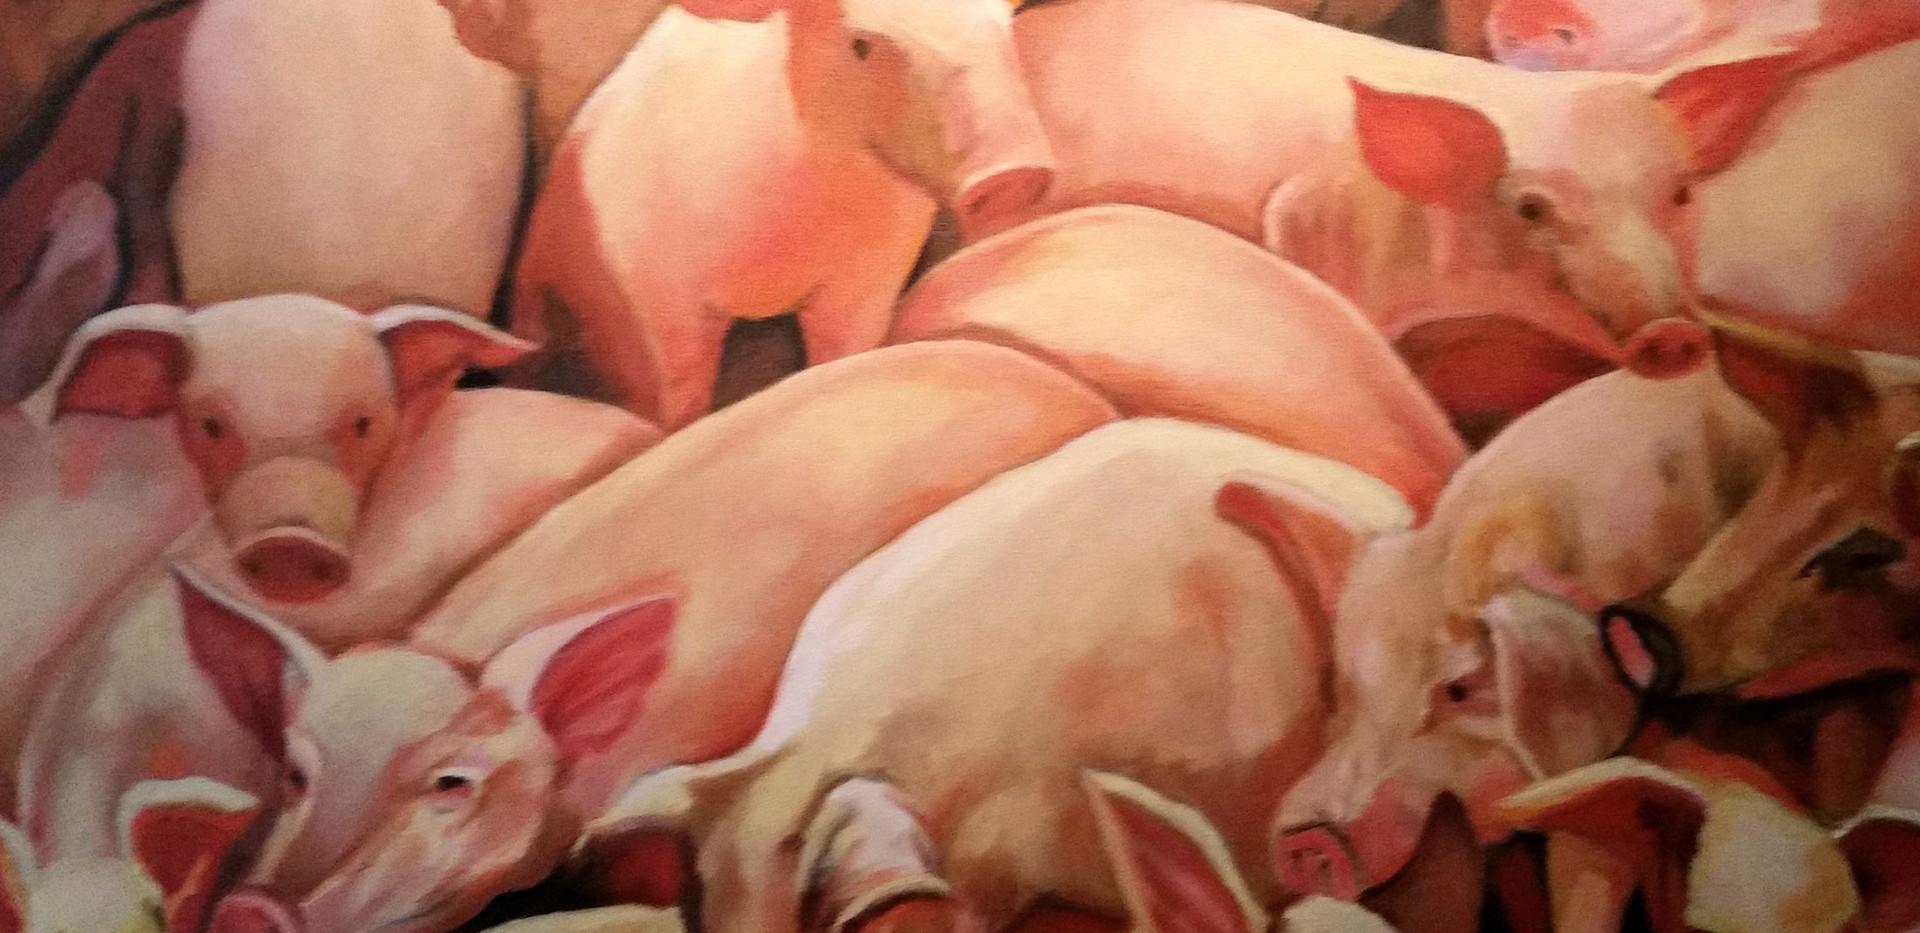 Swine of Gerasenes